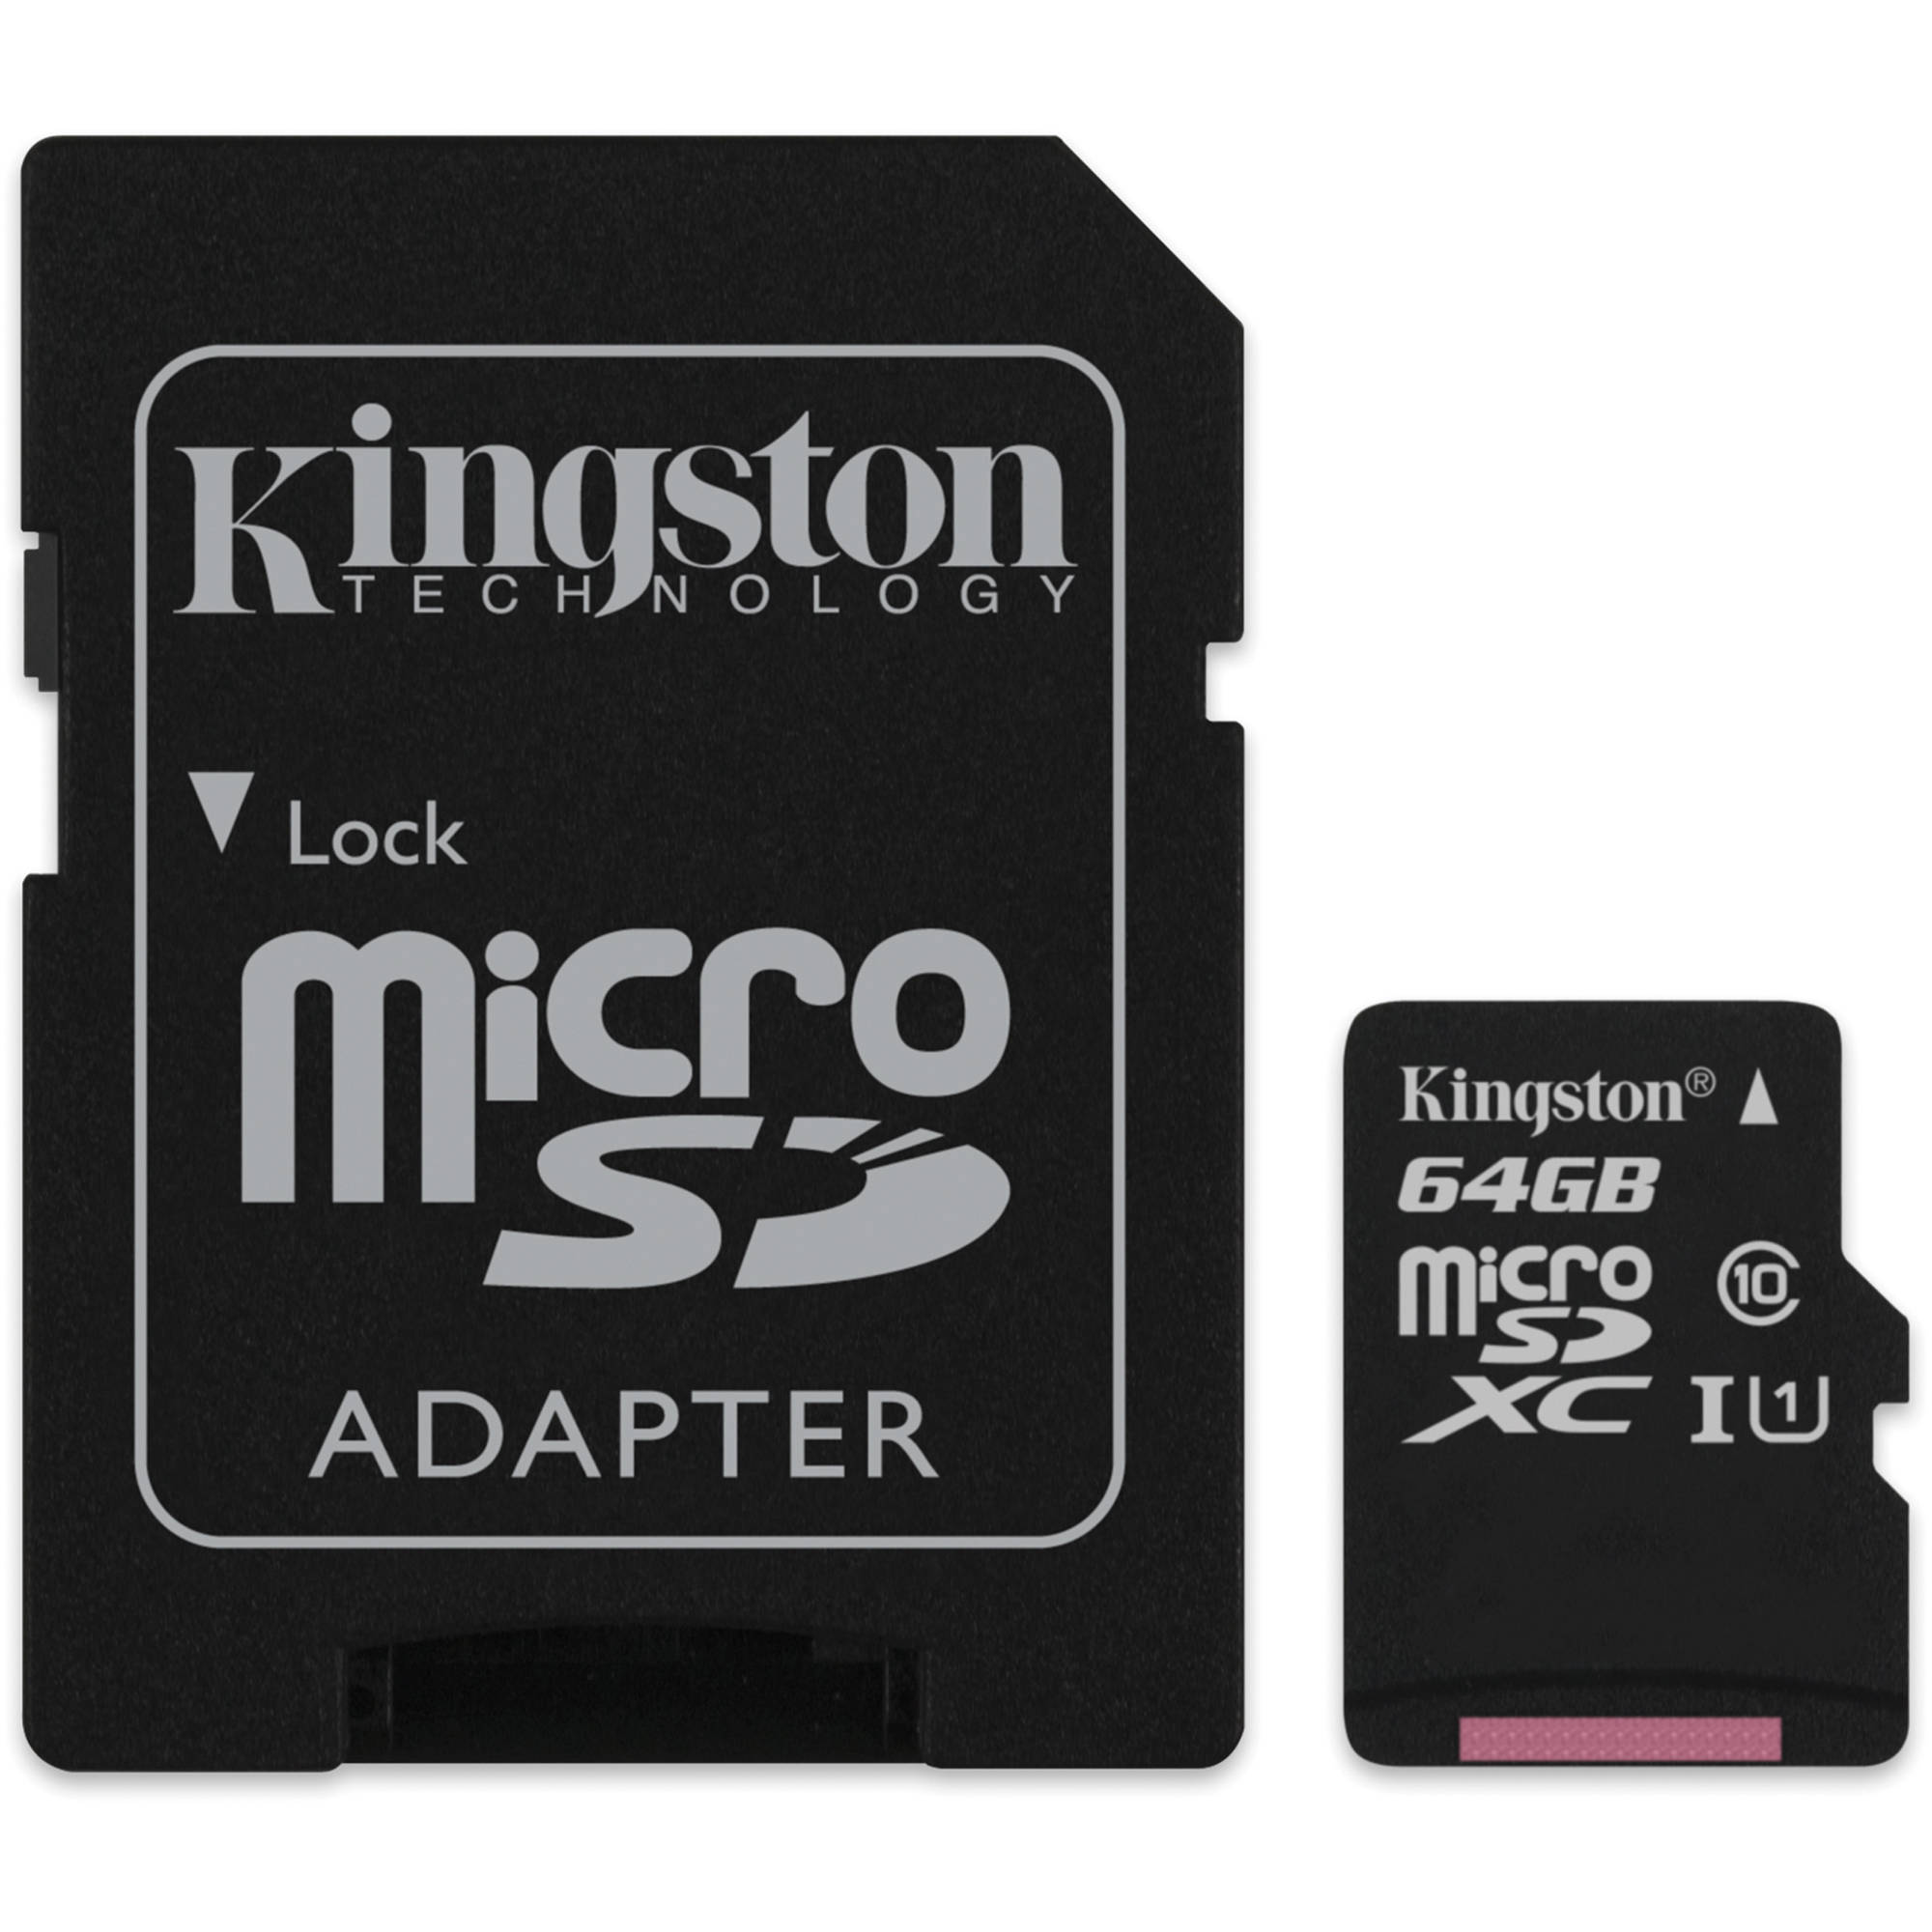 Kingston 64GB MicroSDXC UHS-I/U1 Class 10 Memory Card with ...